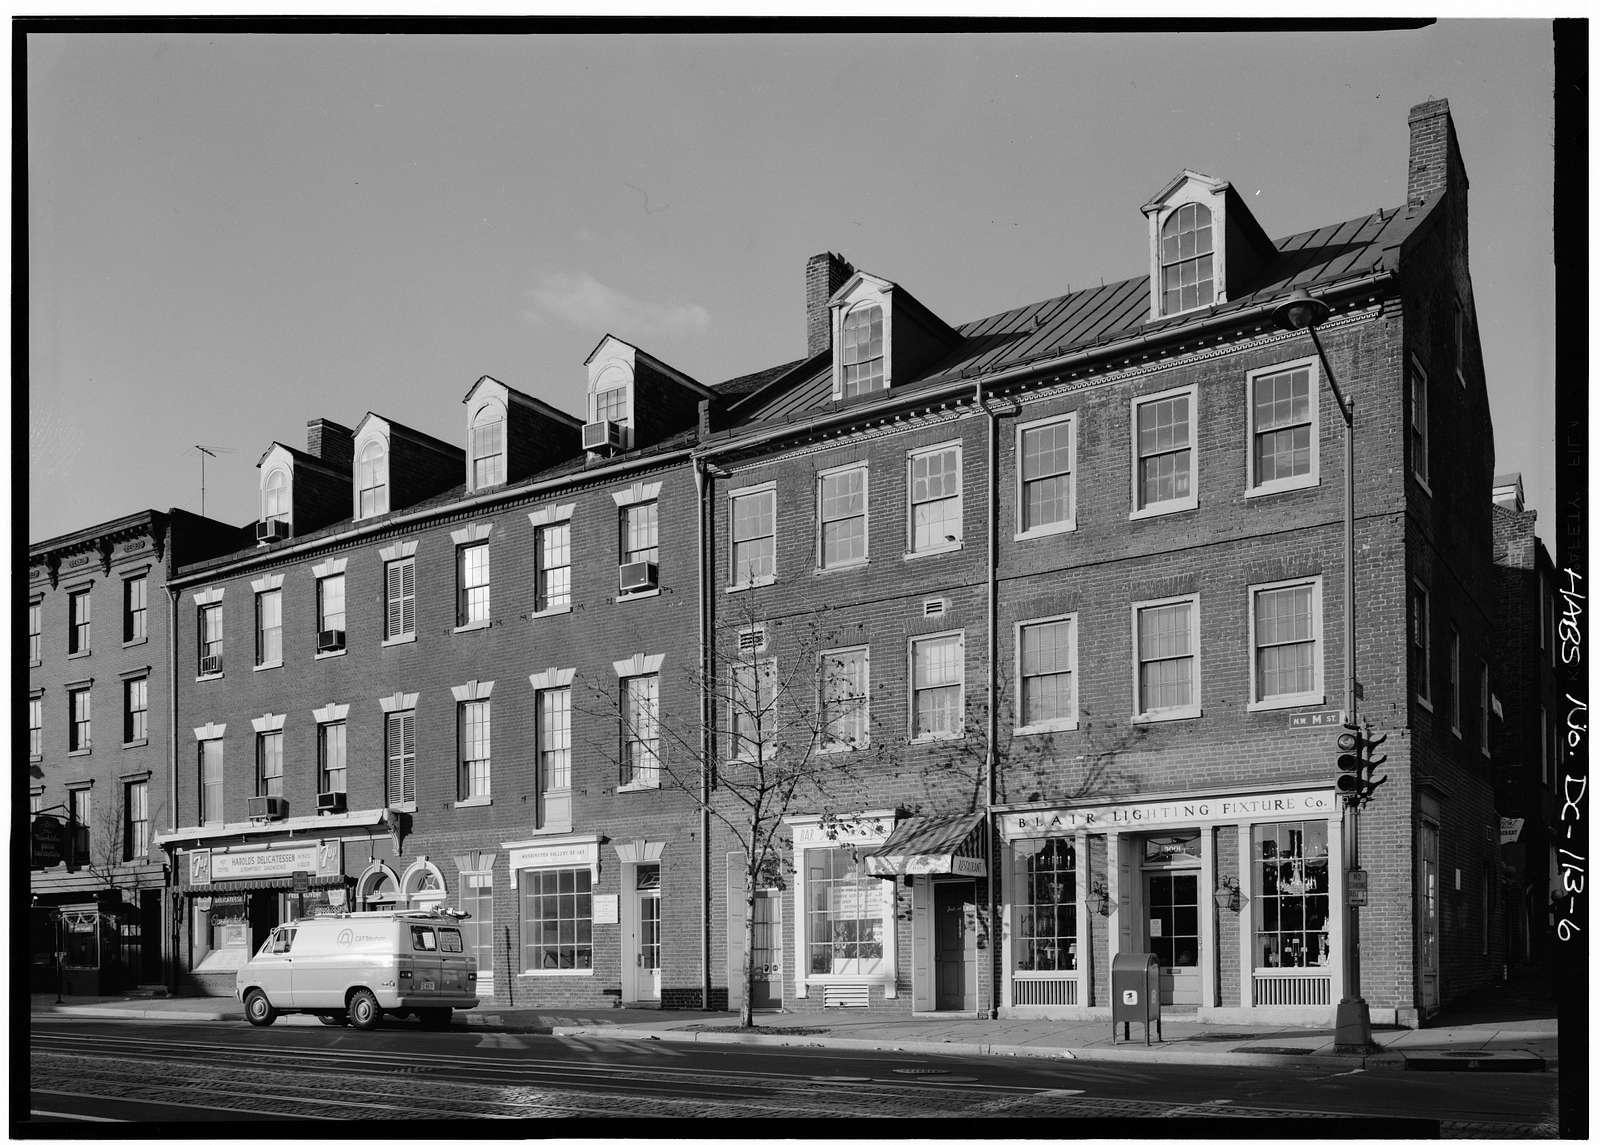 Ross & Getty Building, 3005-3011 M Street Northwest, Washington, District of Columbia, DC